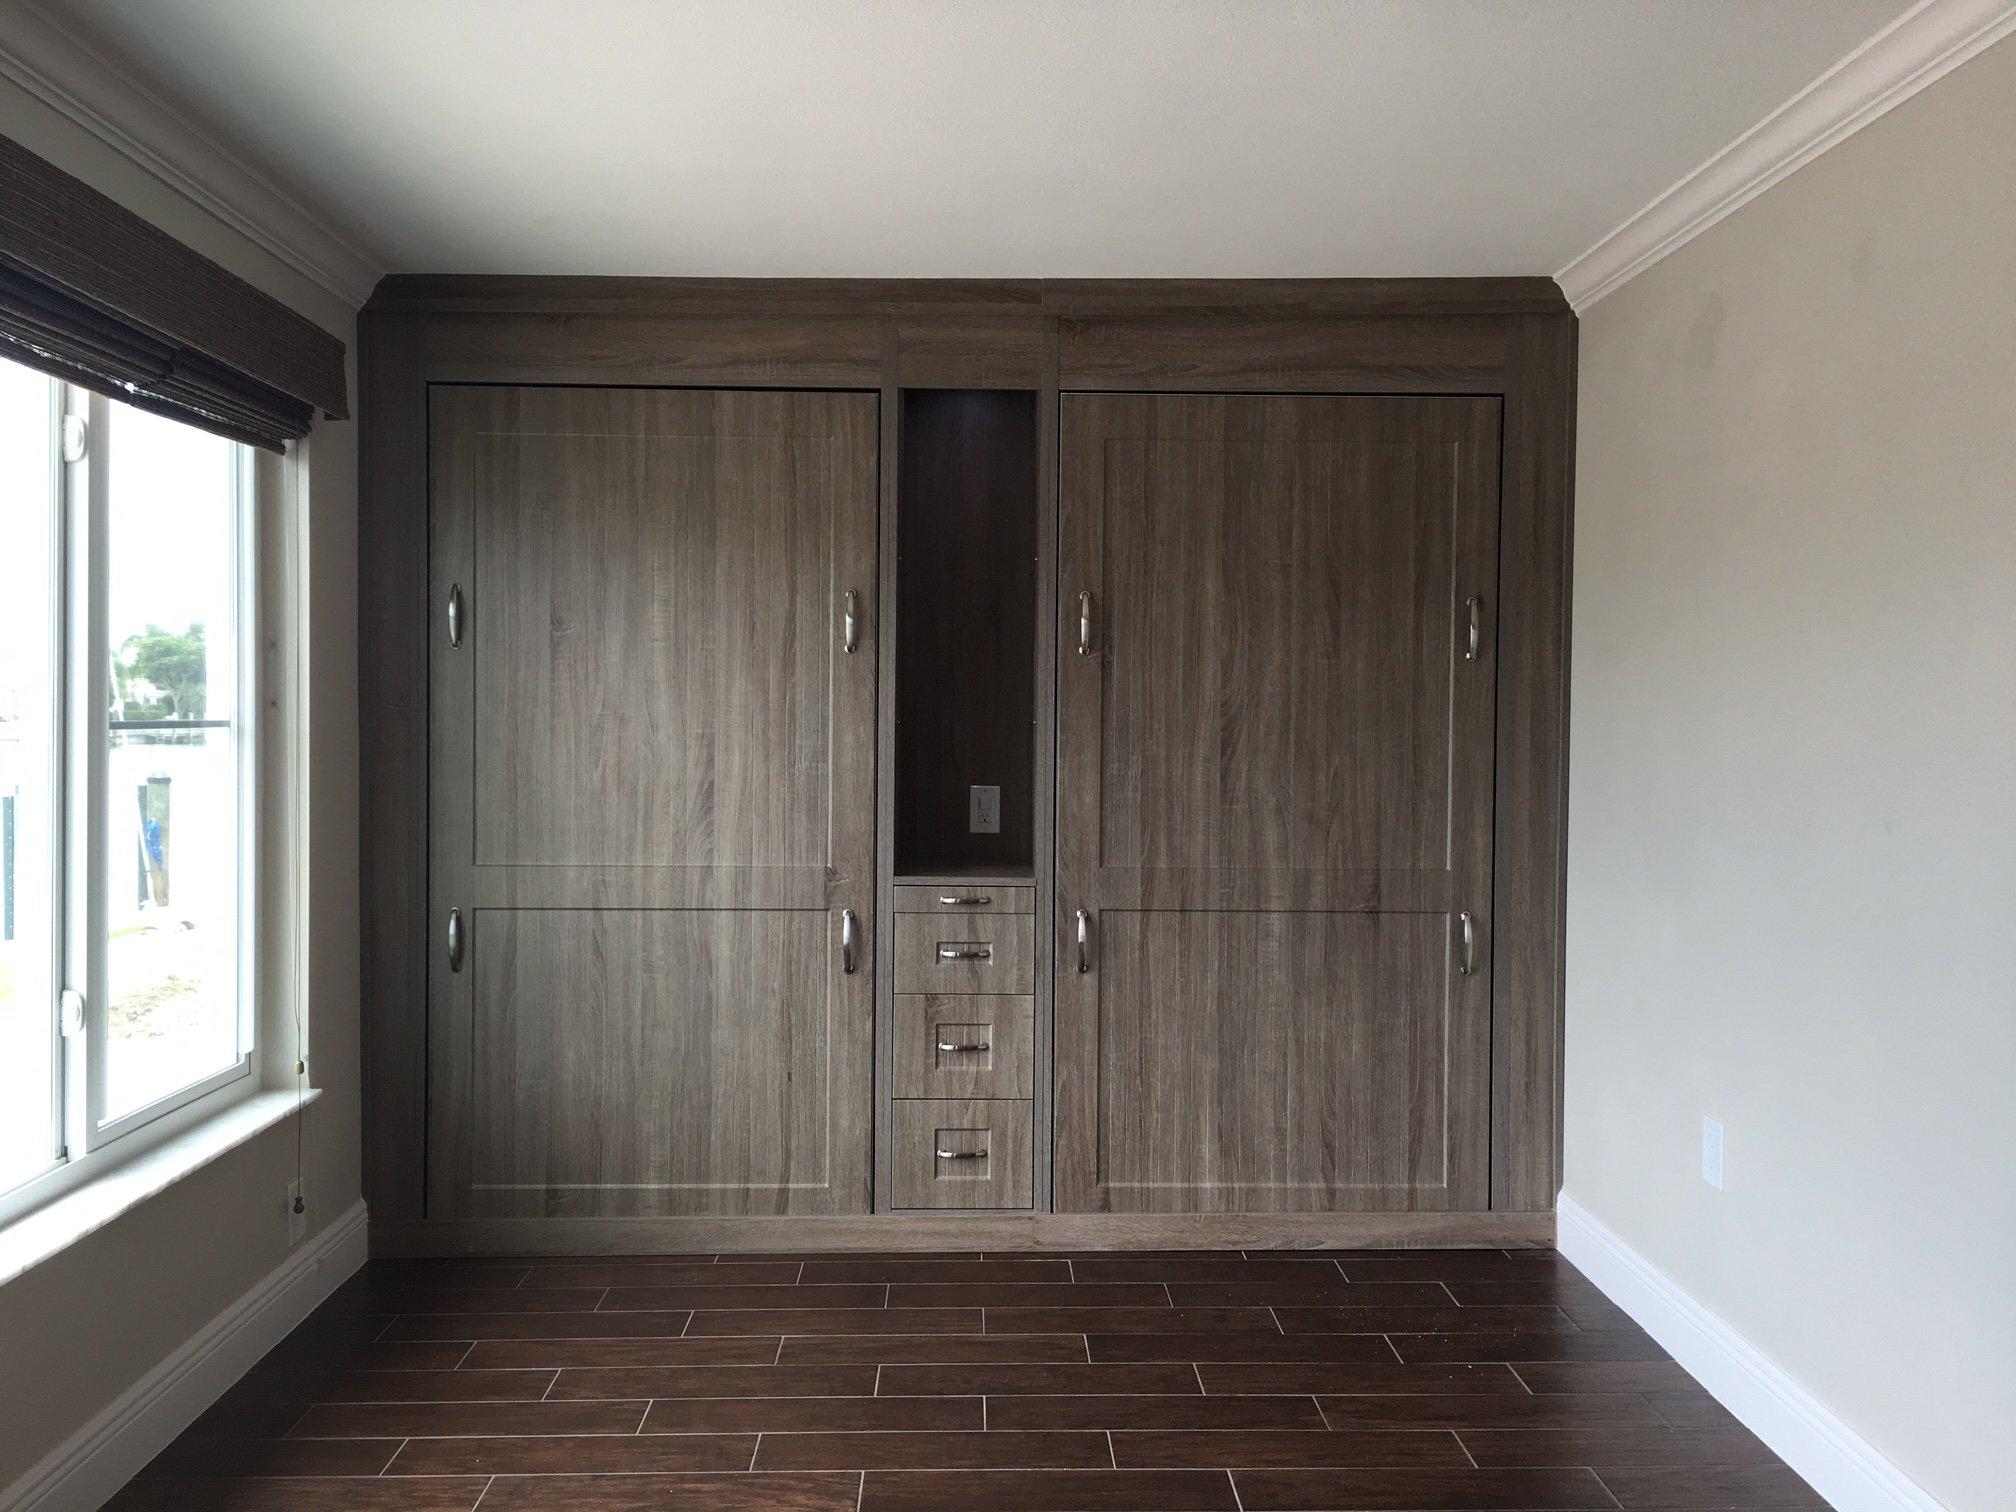 Custom Made Modern Wall Beds For Sarasota Home Closet